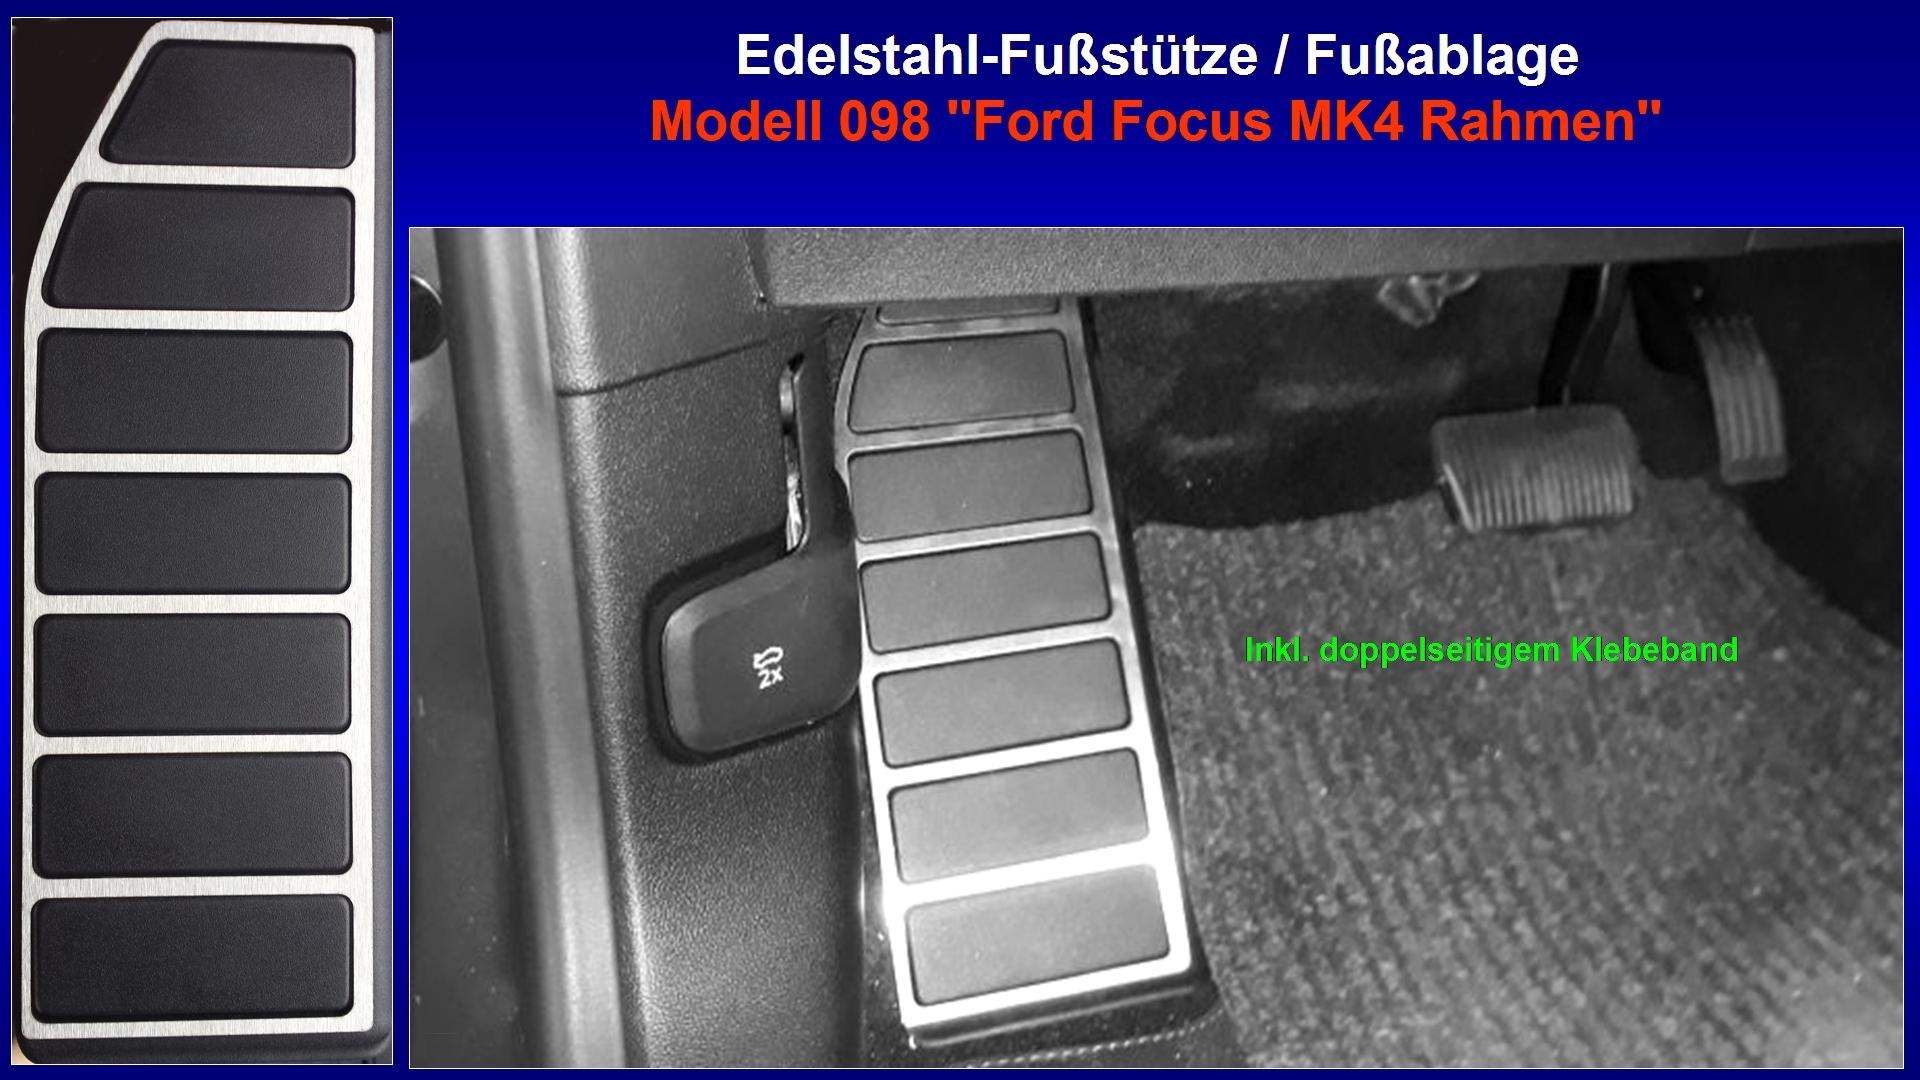 Präsentation Edelstahl-Fußstütze Modell 098 ''Ford Focus MK4 Rahmen'' [Einfassung Plastikteil].jpg